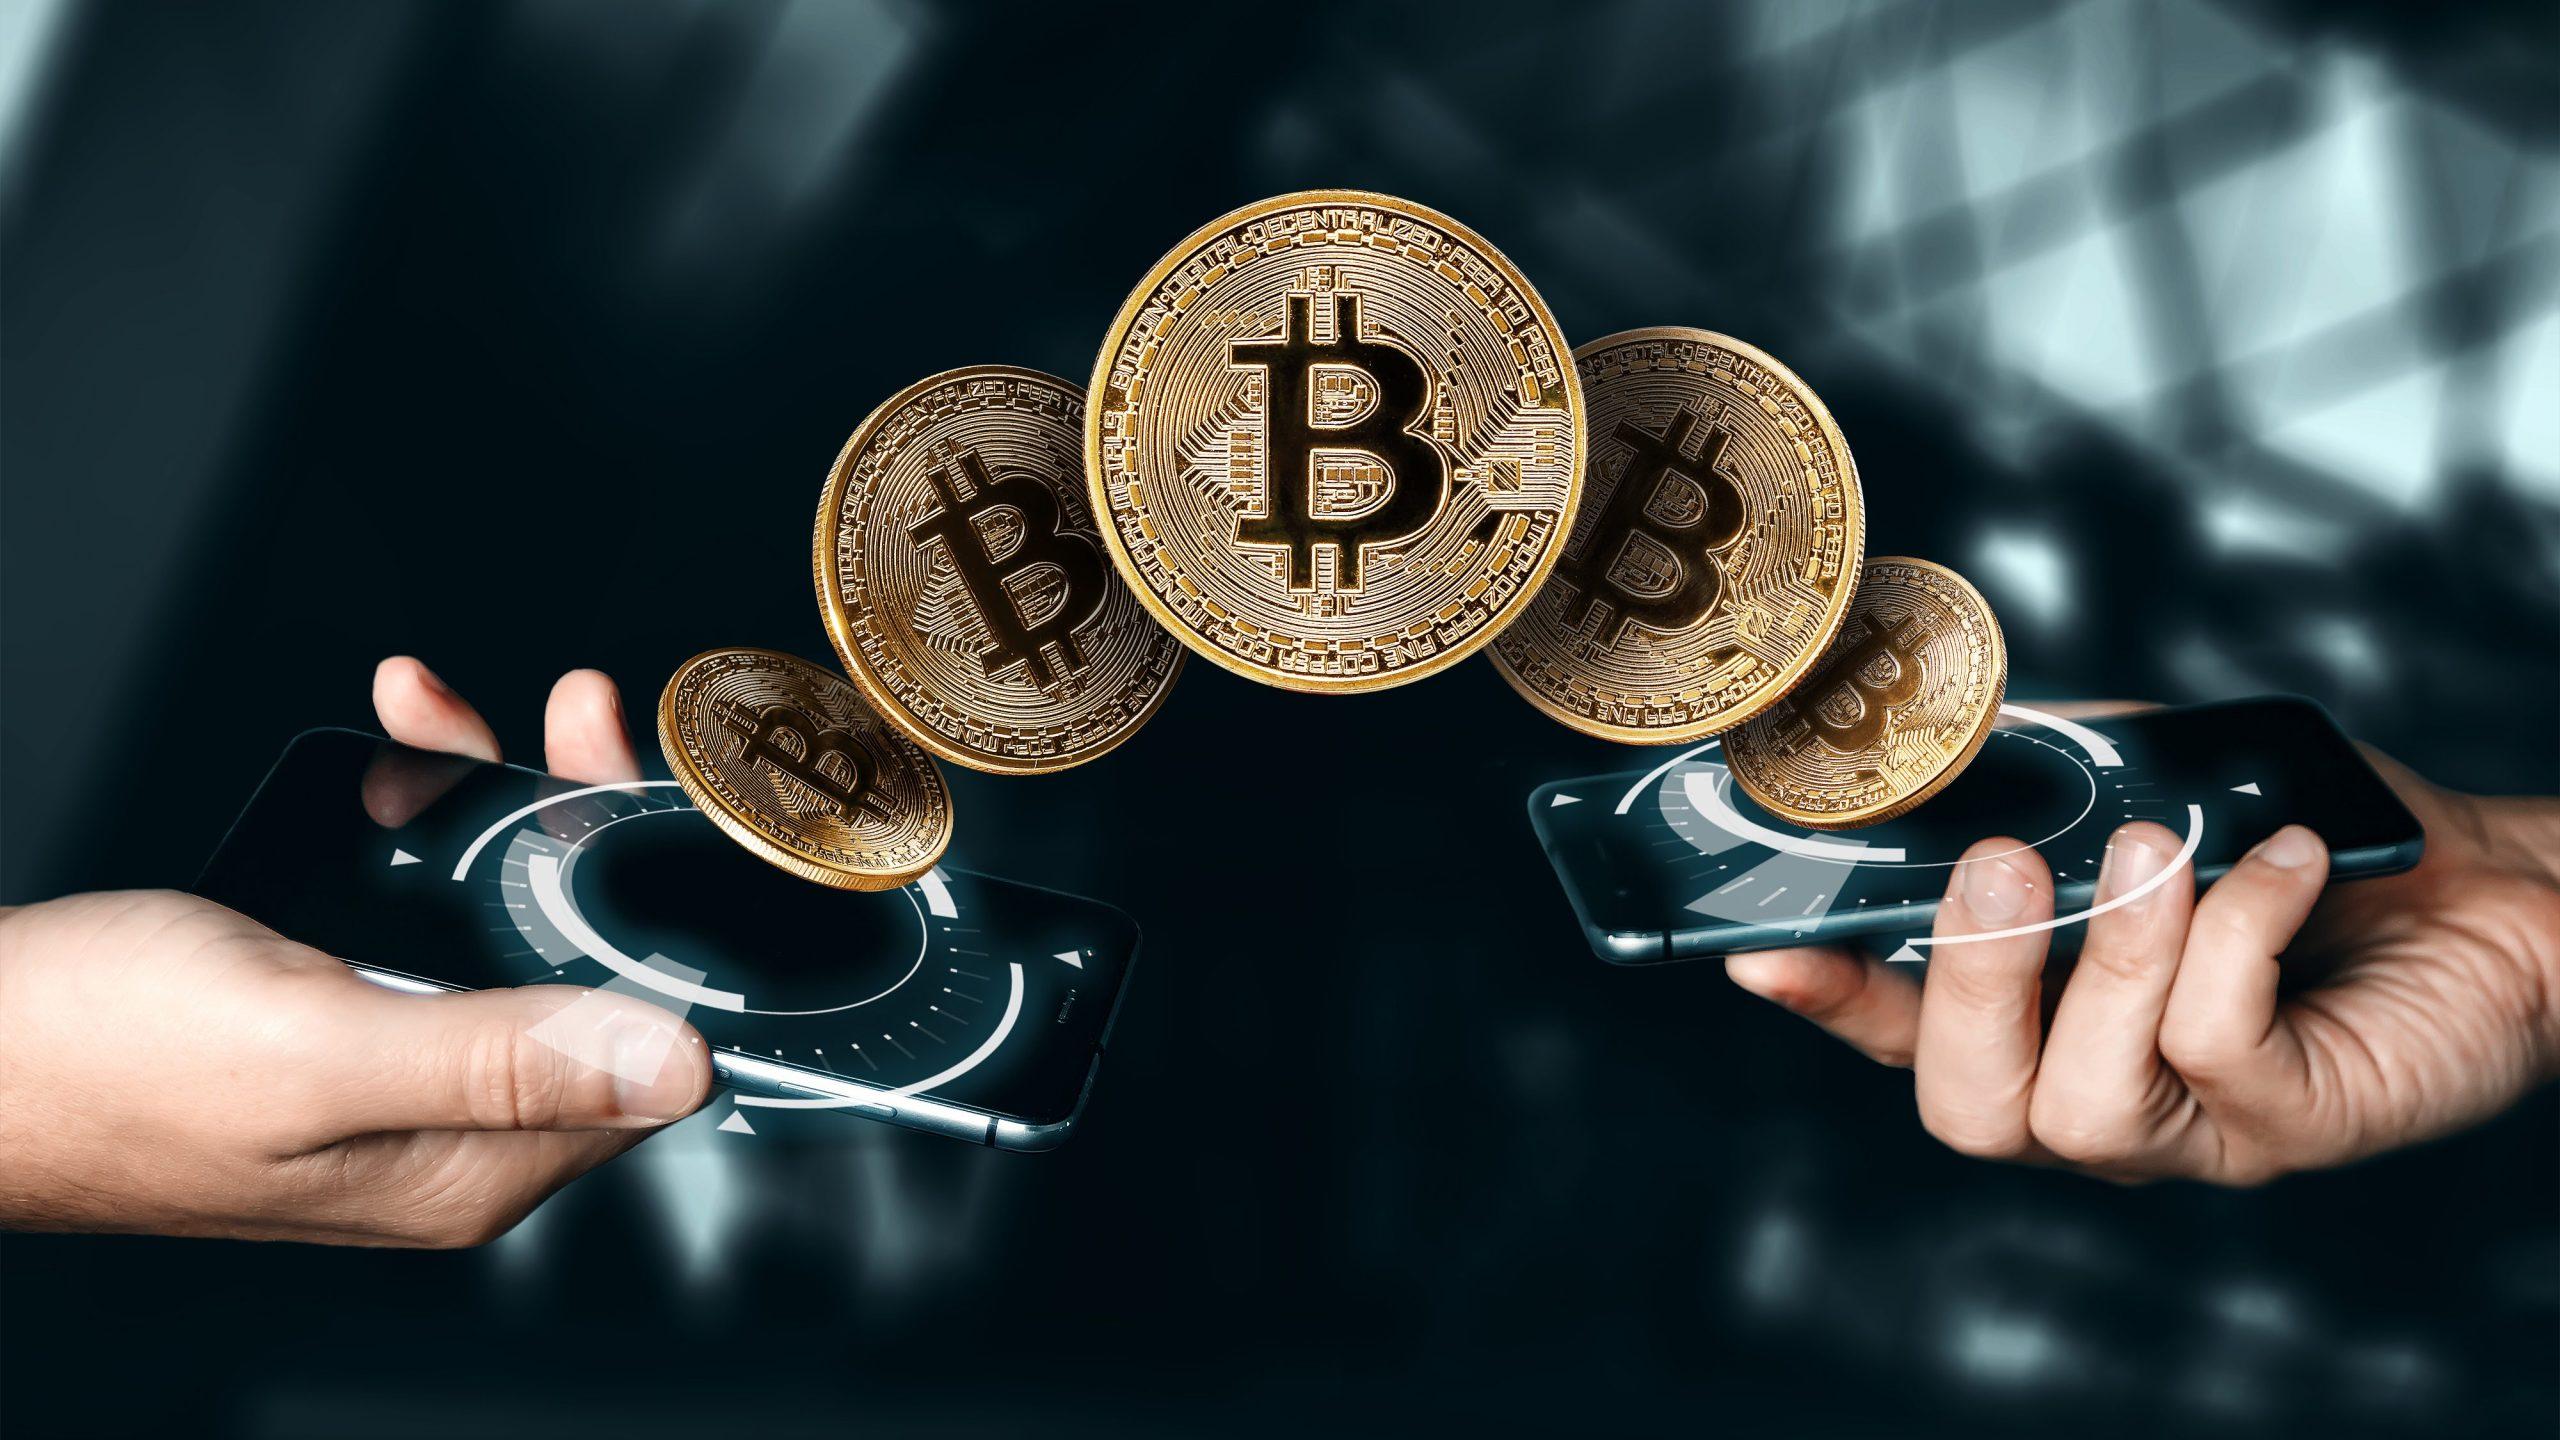 gold-coin-bitcoin-currency-blockchain-technology-4000x2250